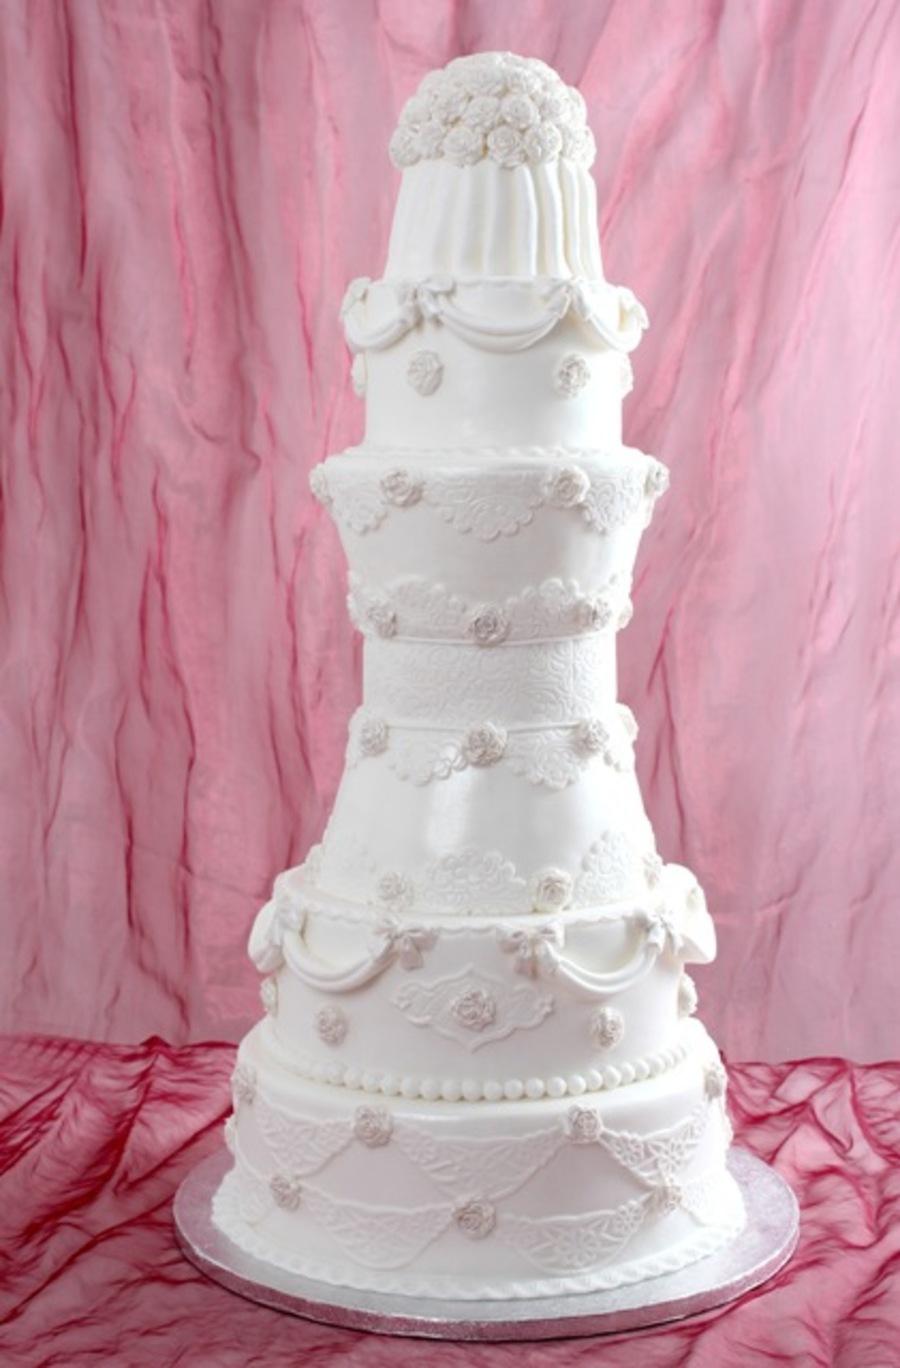 8 Layered White Wedding Cake - CakeCentral.com